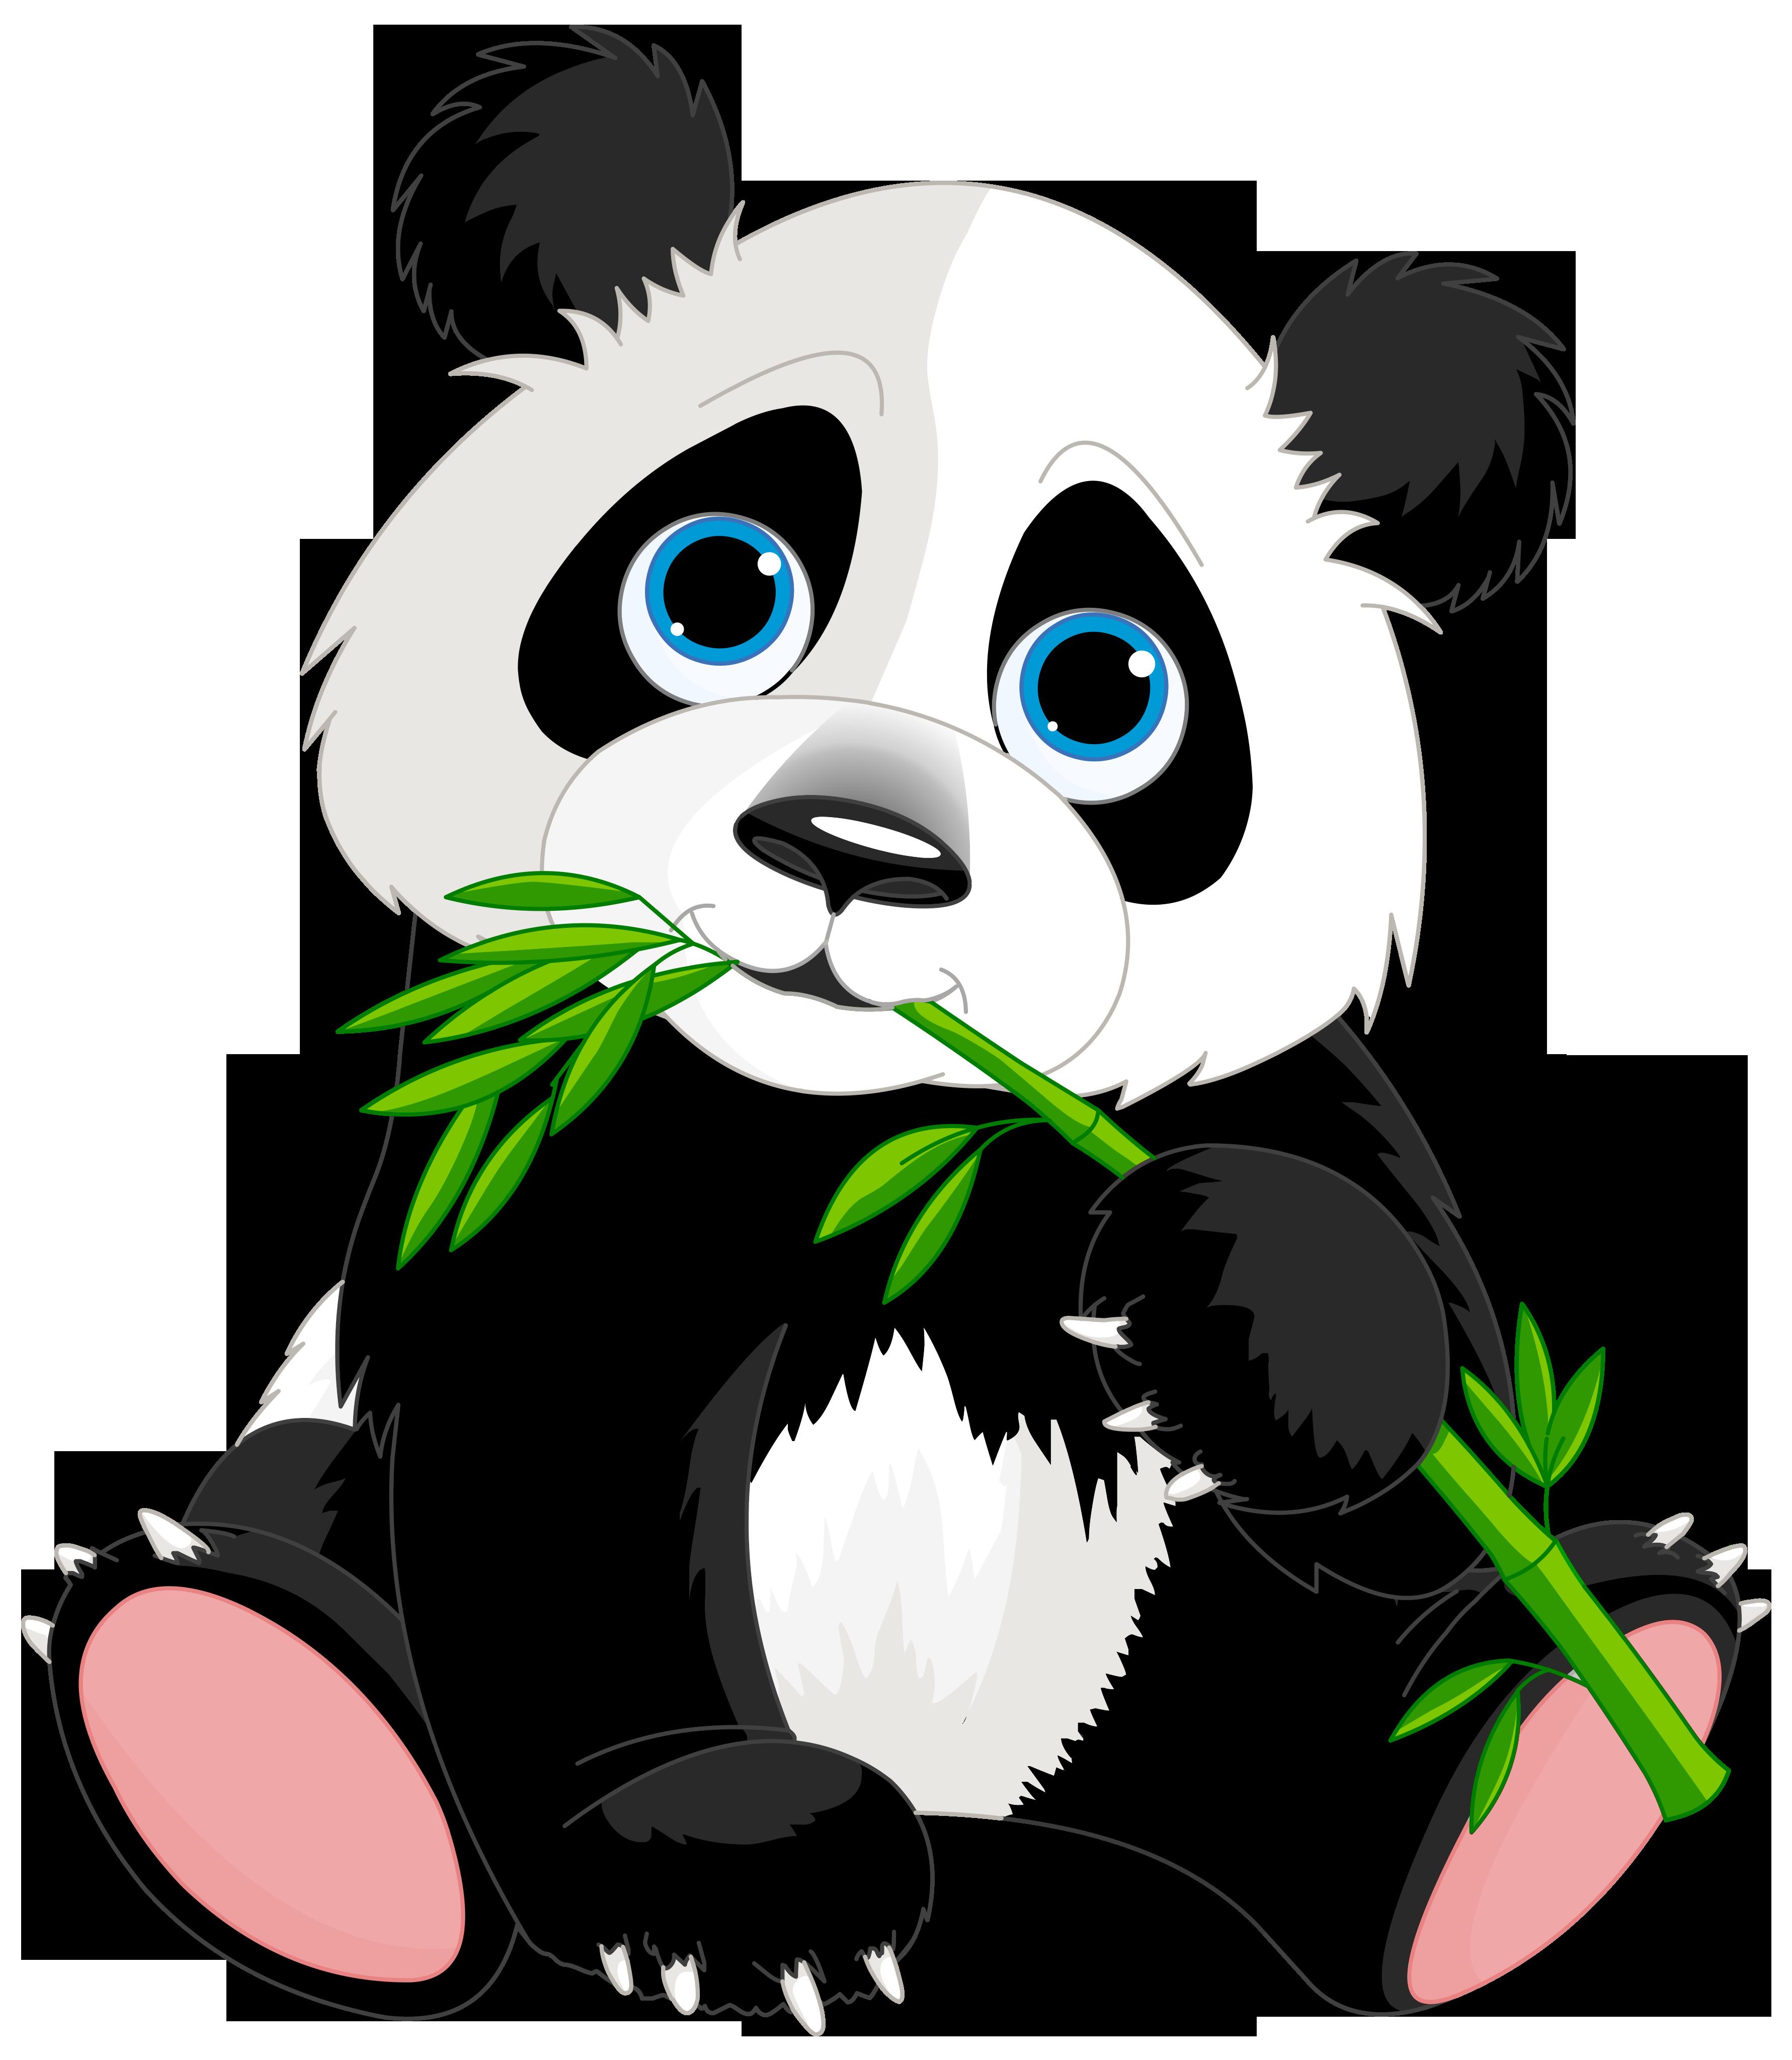 Panda bamboo clipart.